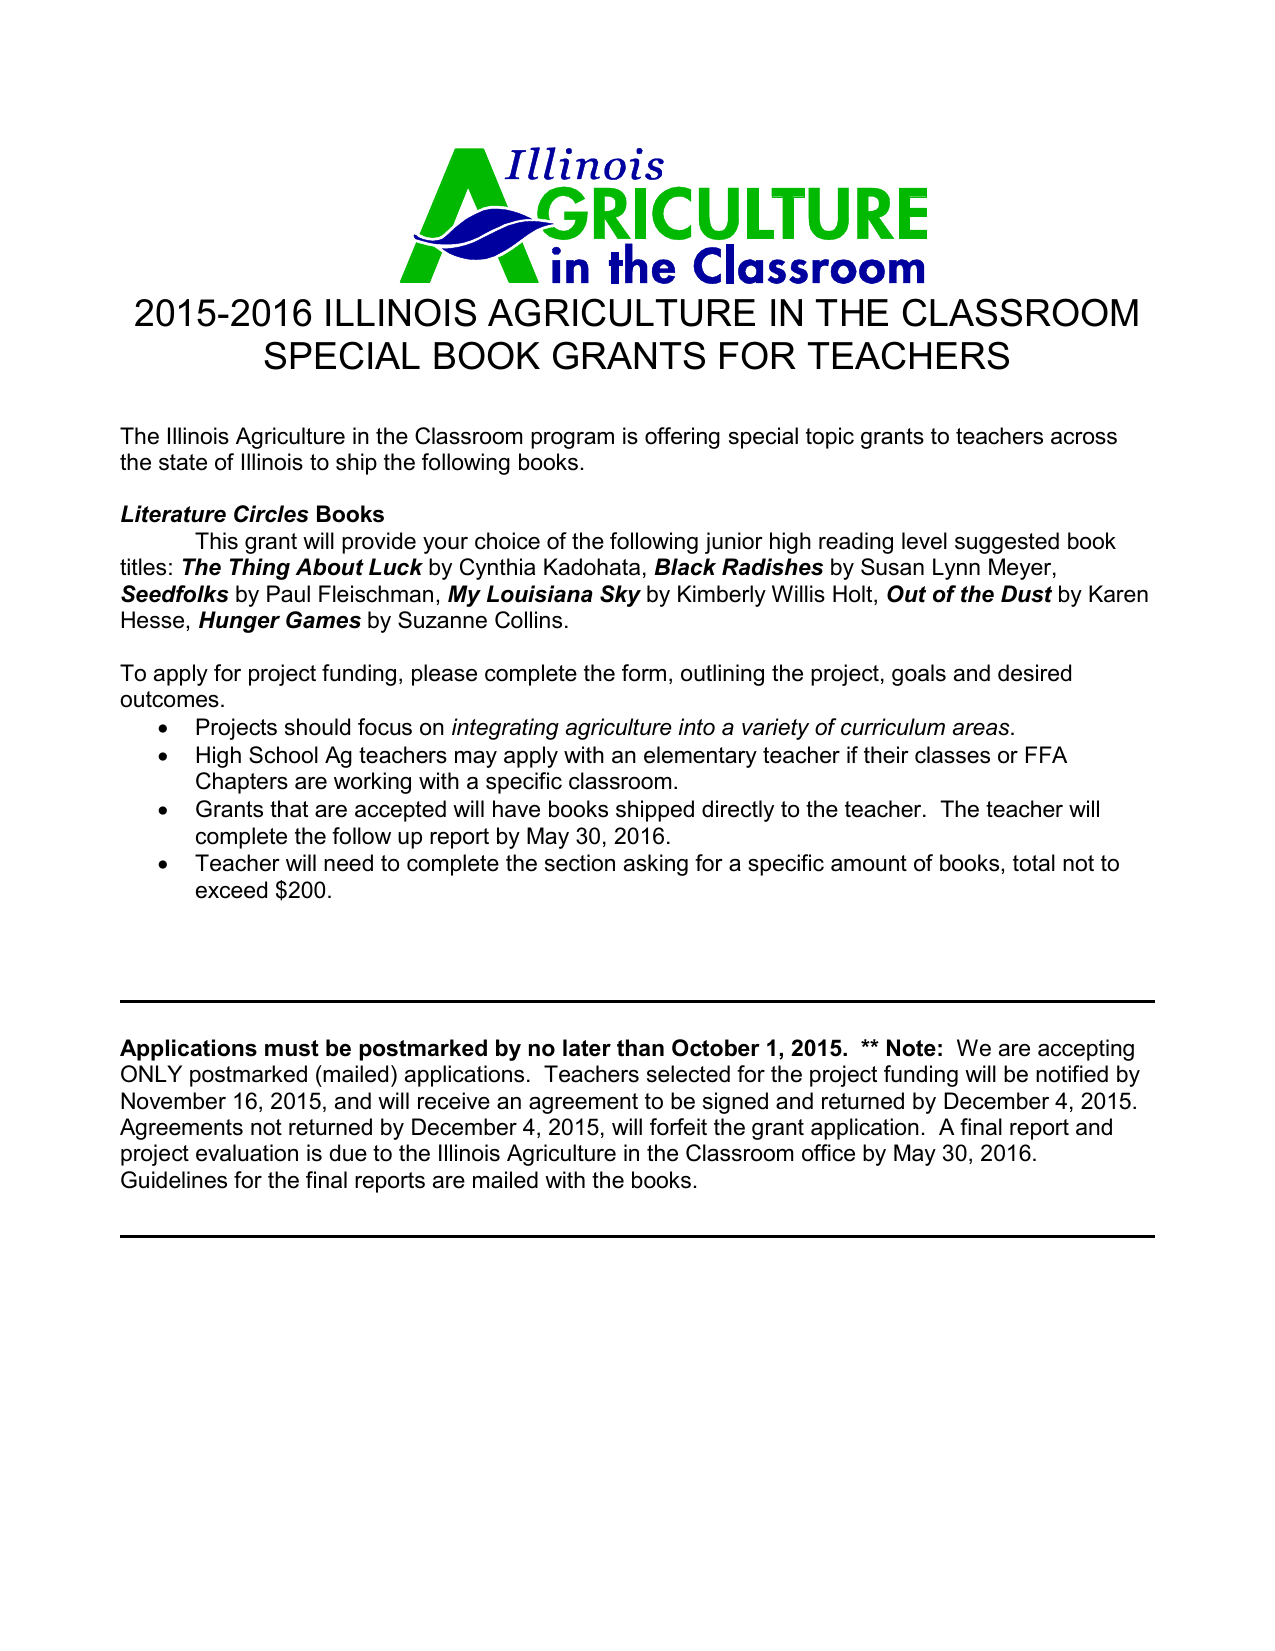 Literature Circles Books - Illinois Ag in the Classroom